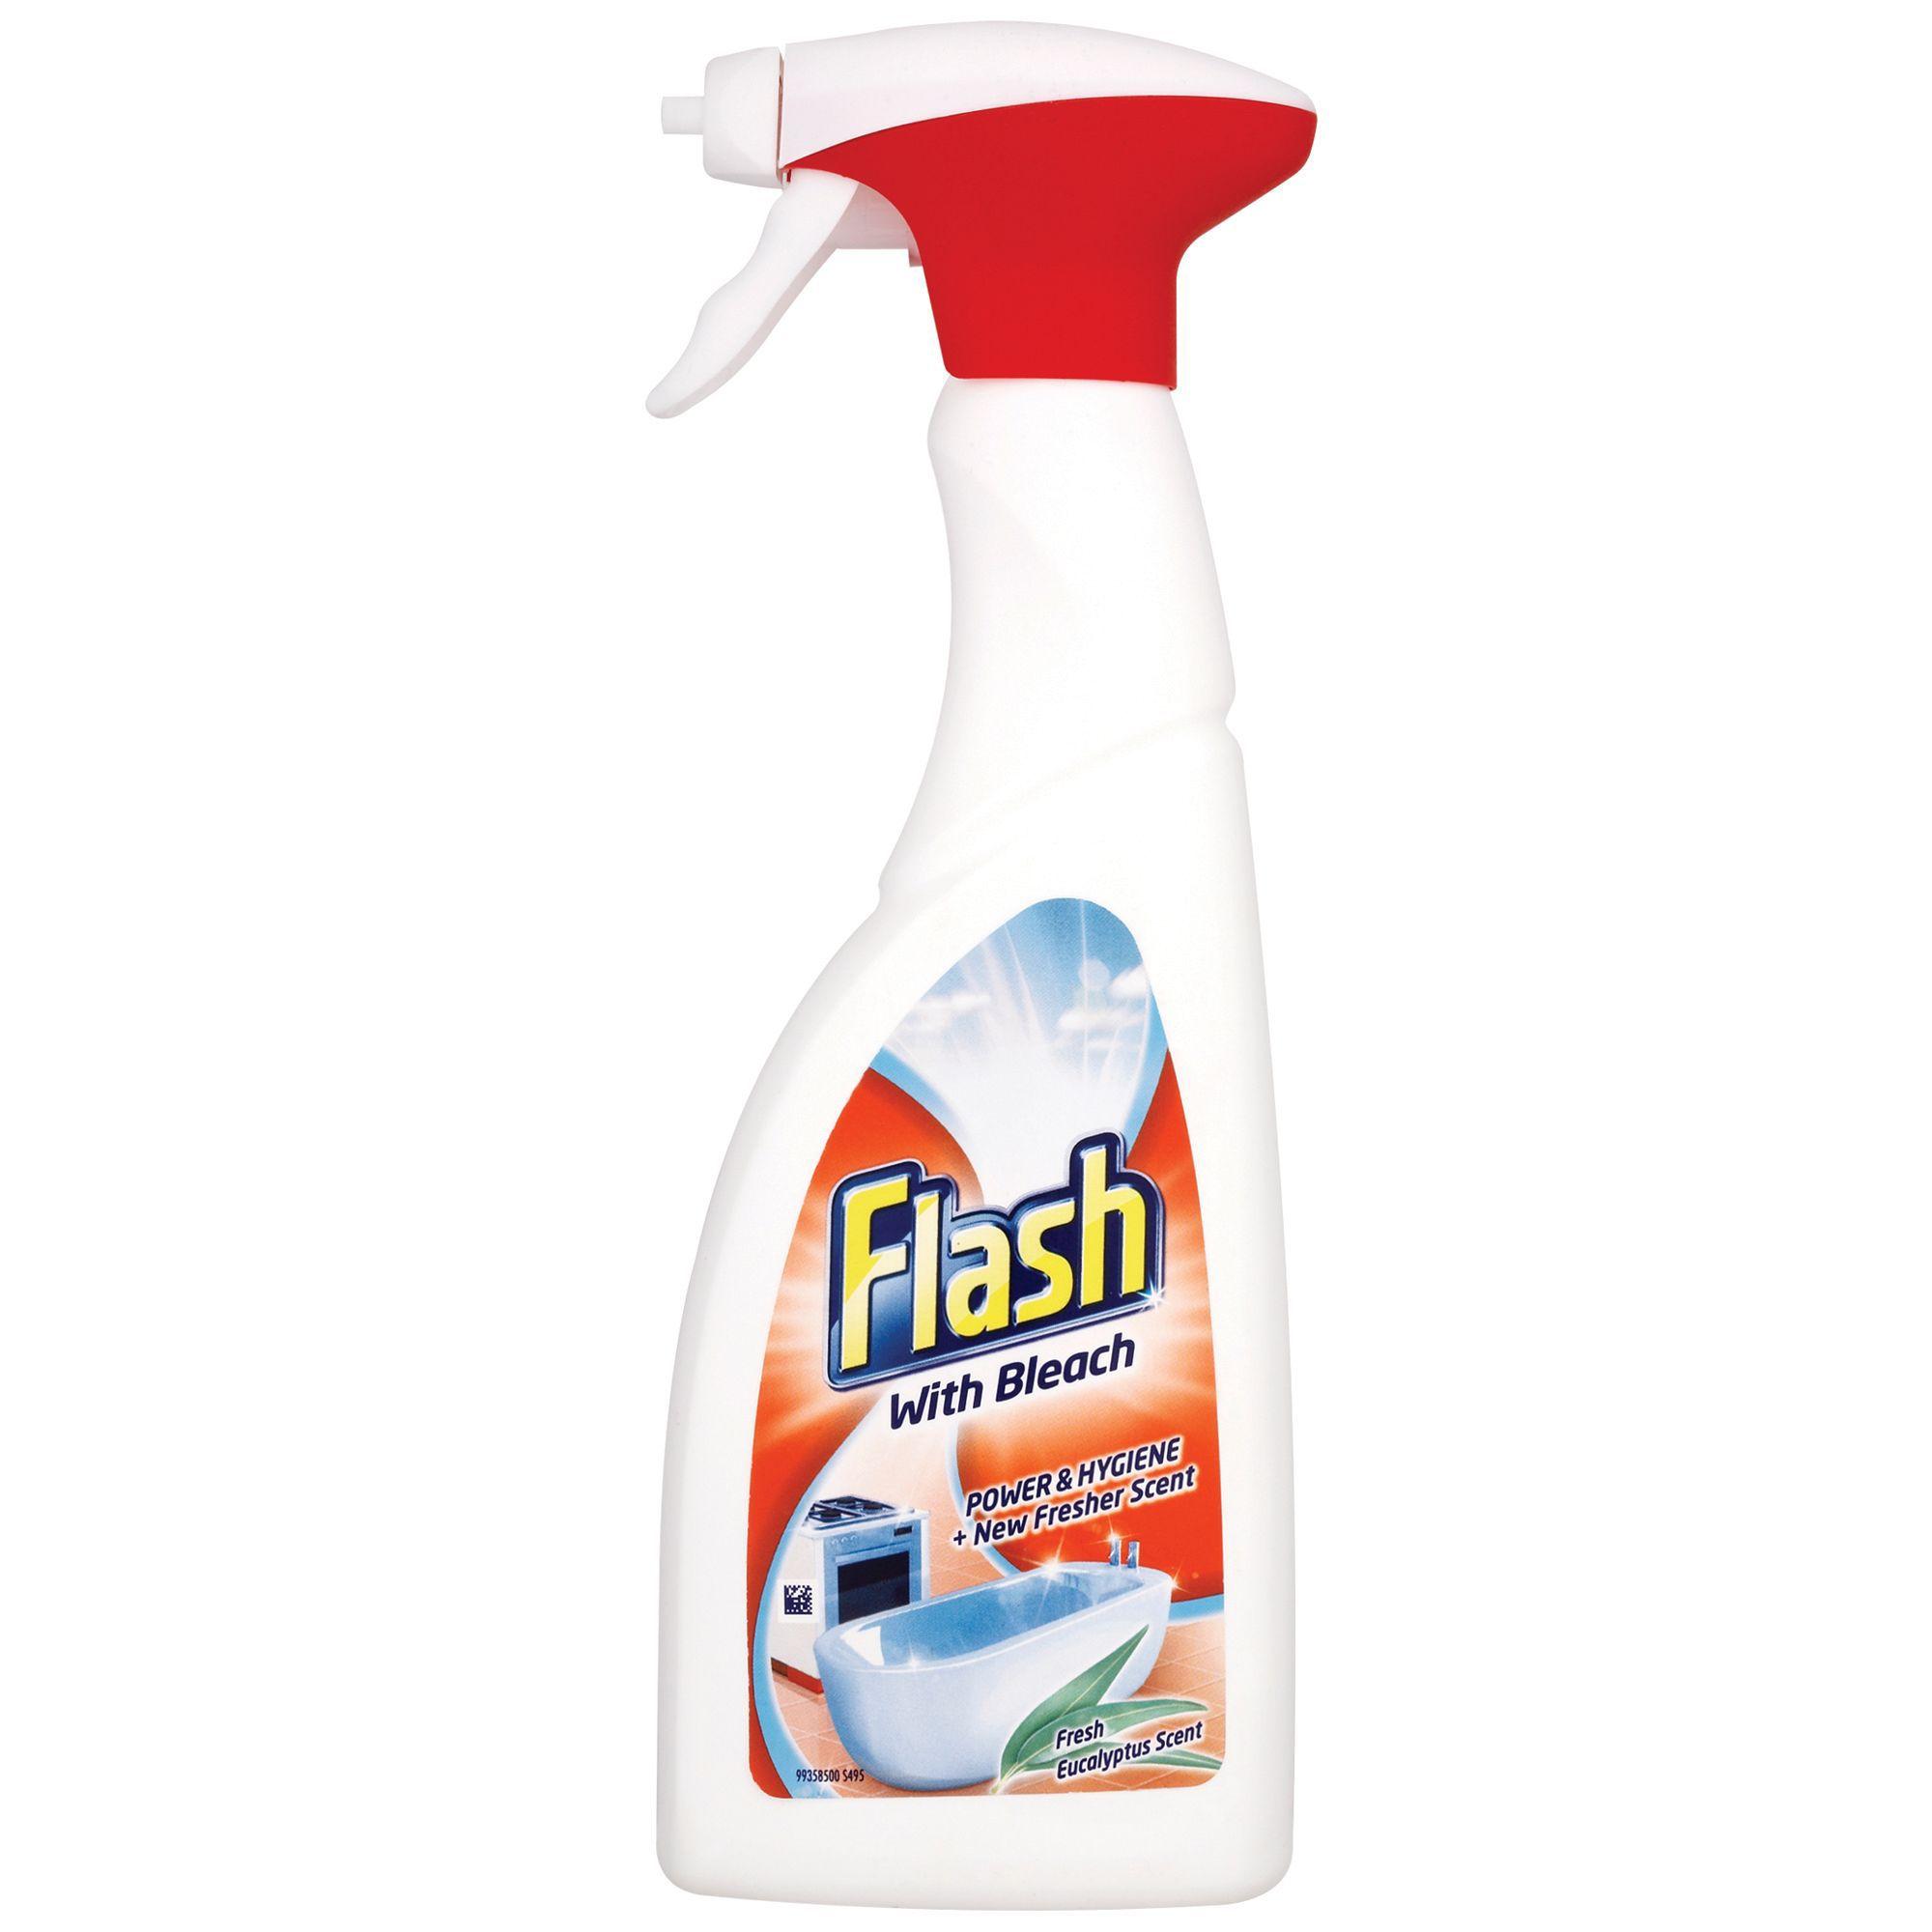 Flashguard Bleach Spray Bottle 500 Ml Departments Diy